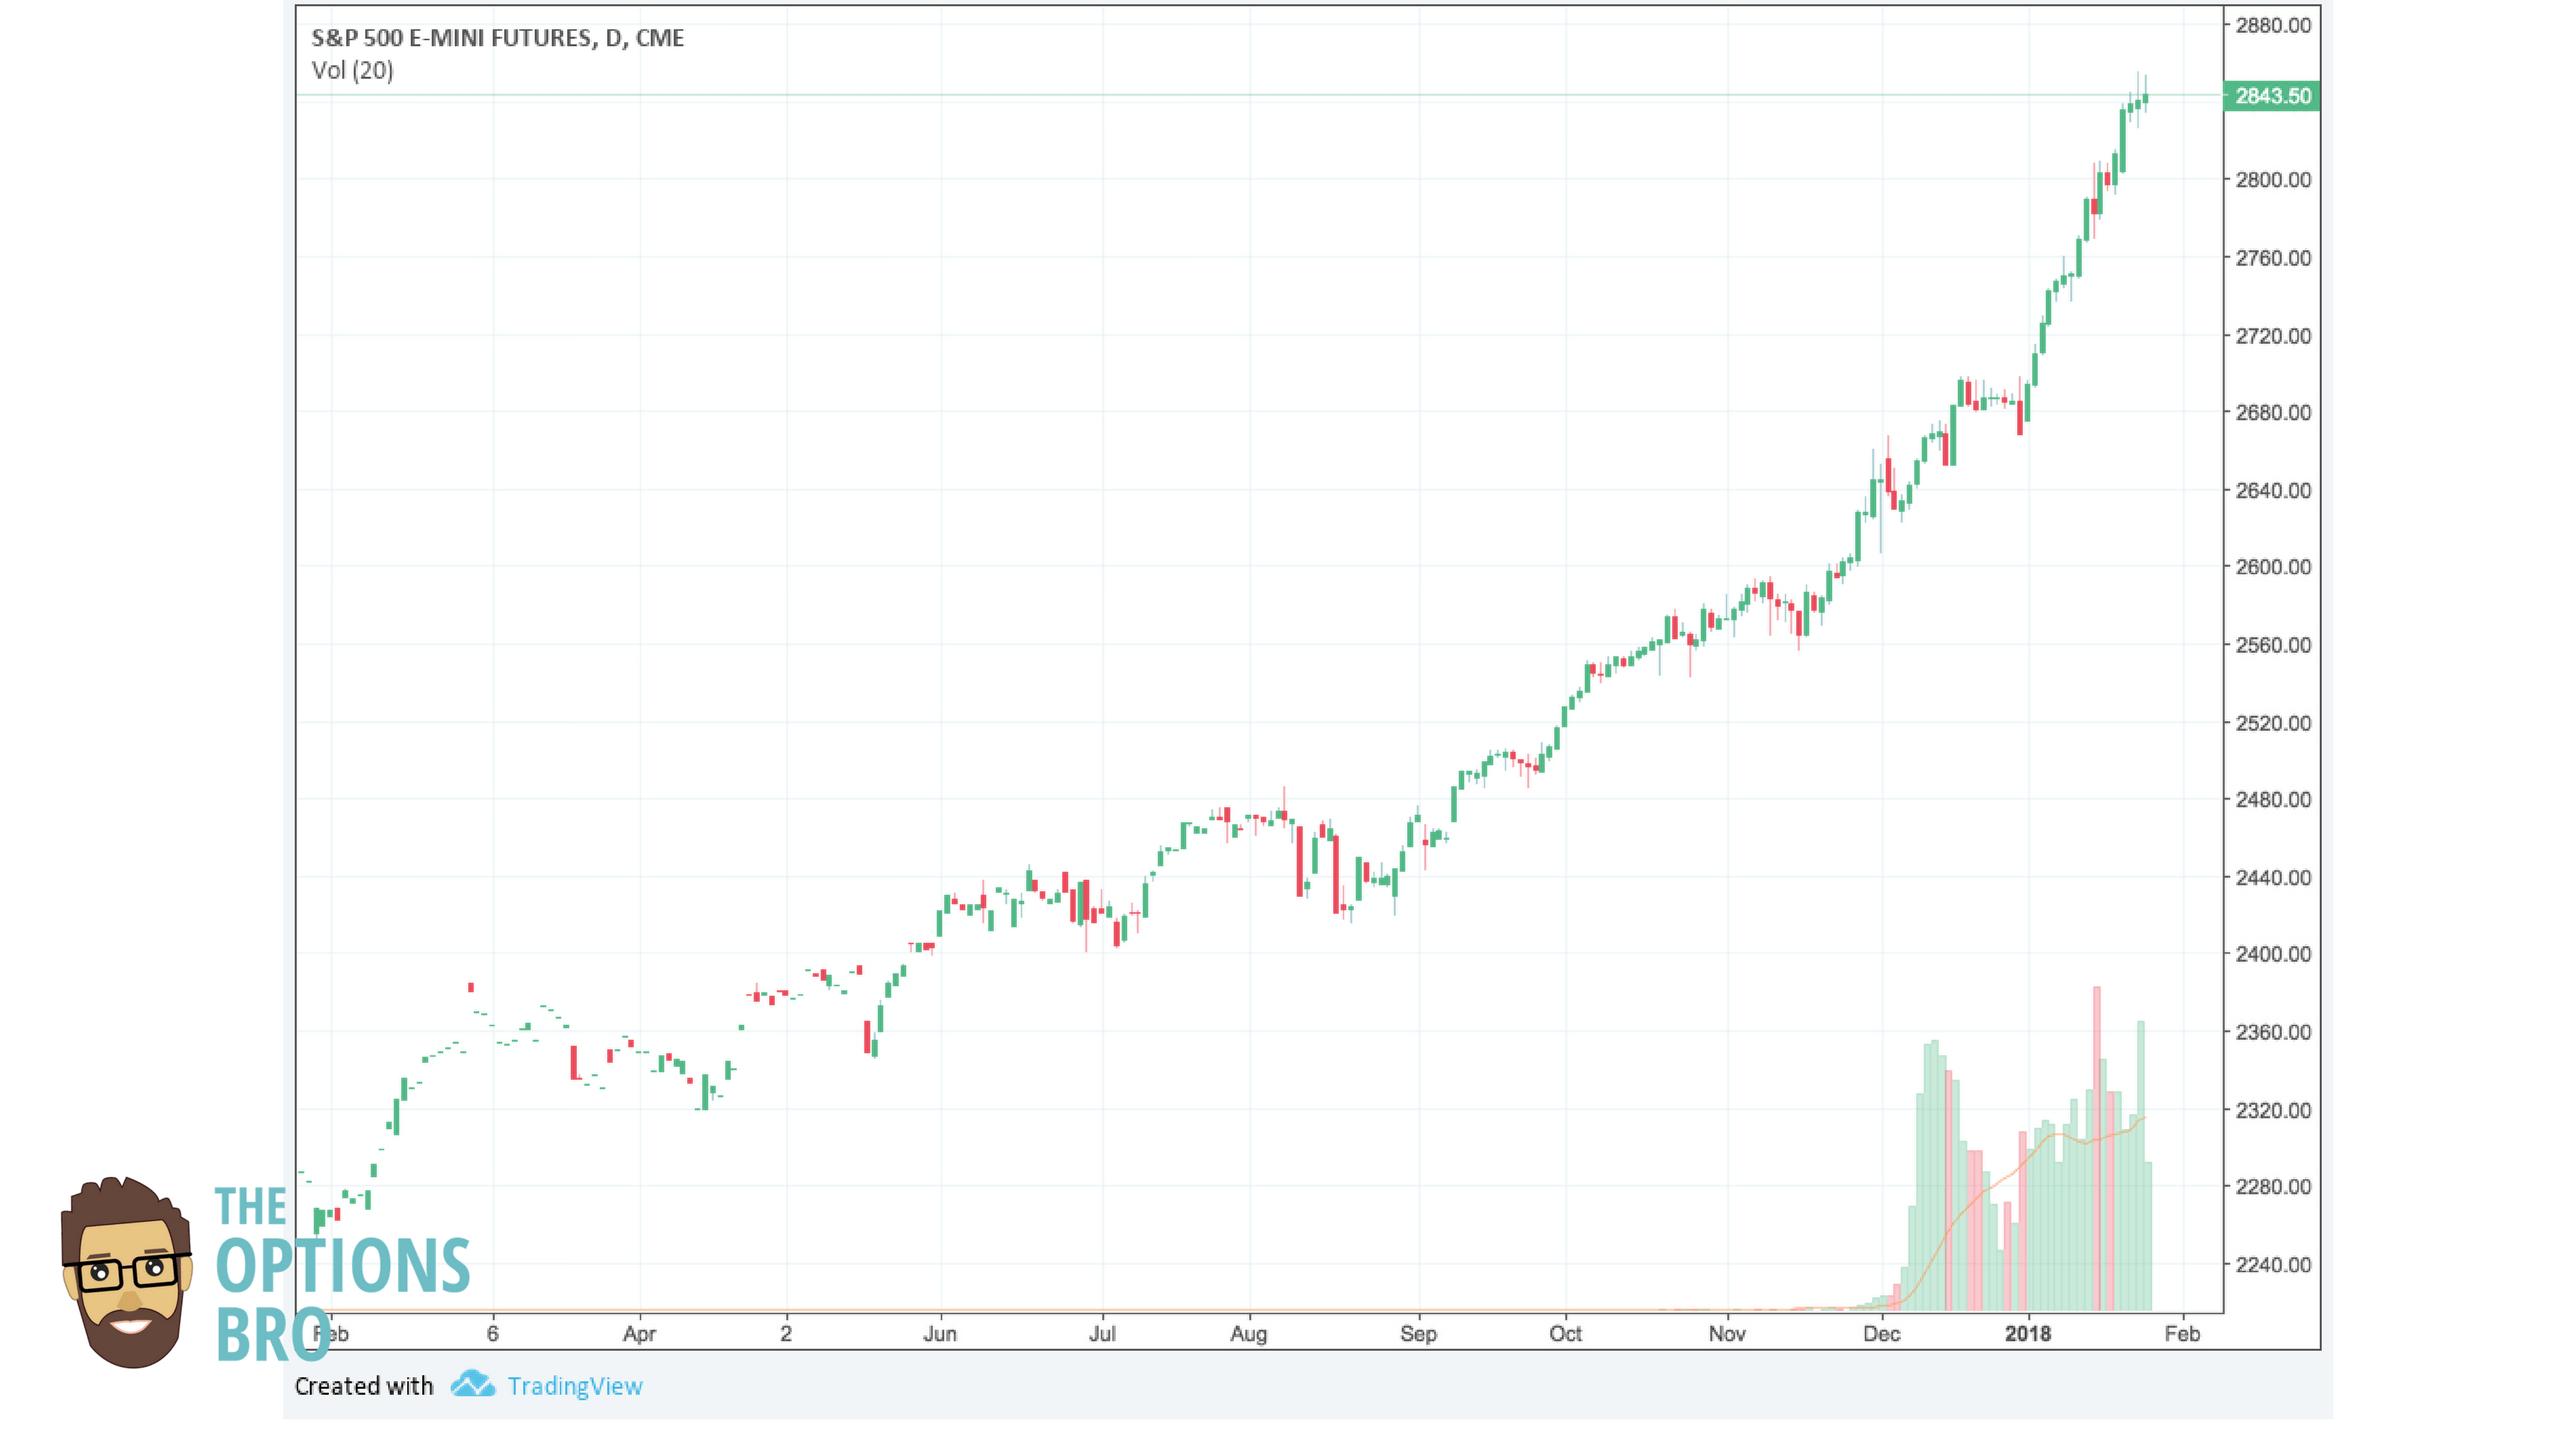 Where do i buy stock options